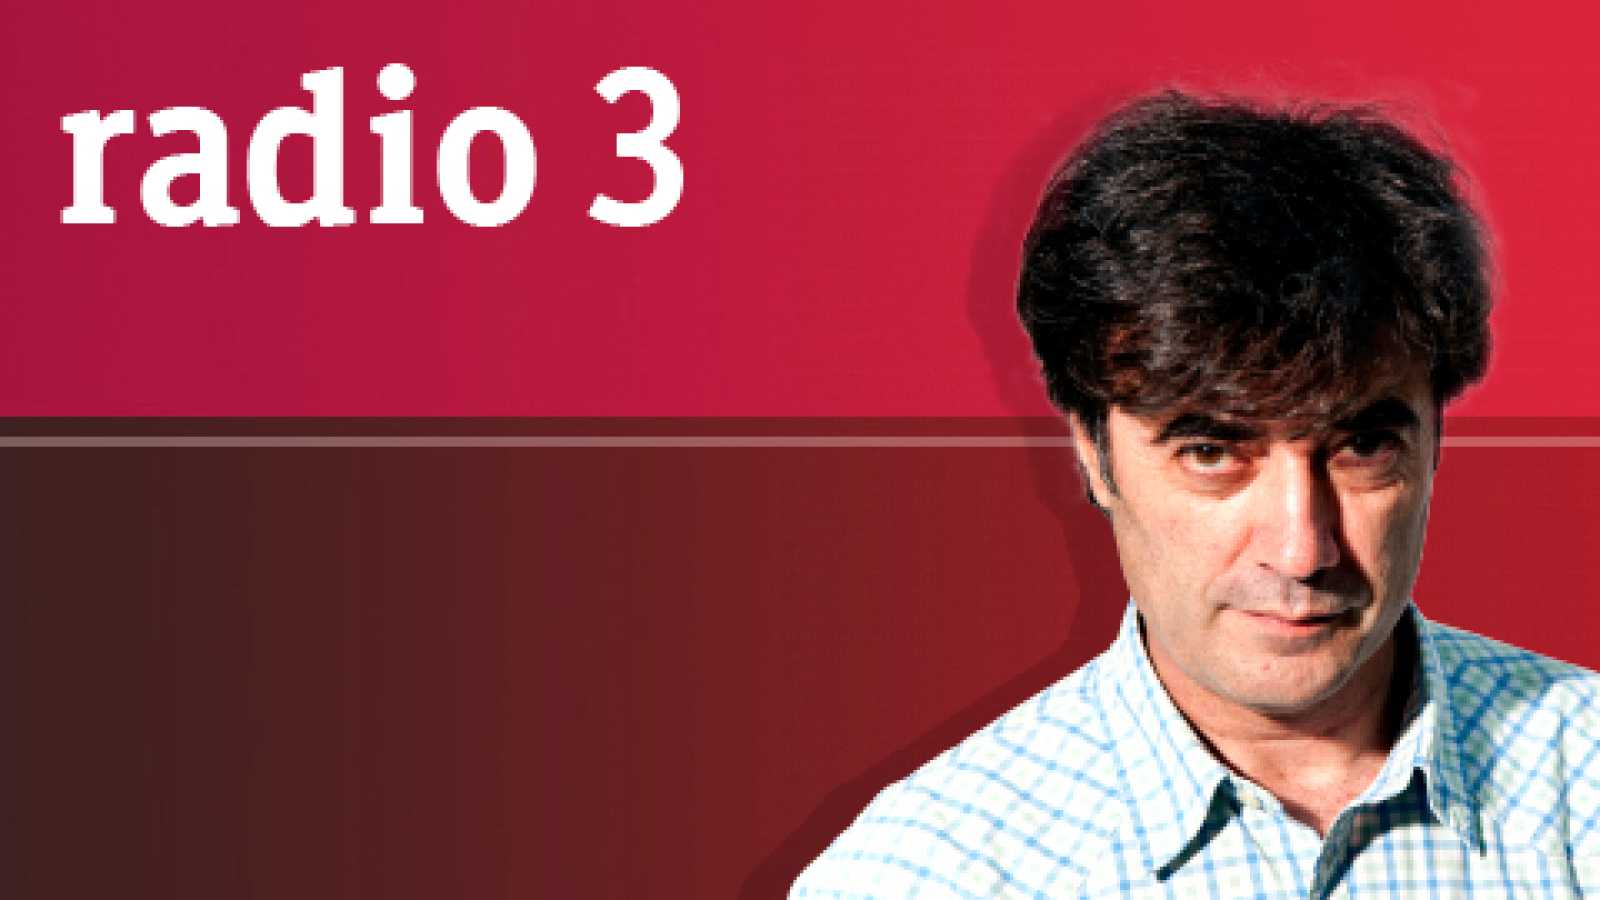 Siglo 21 - Bronquio - 11/05/18 - escuchar ahora